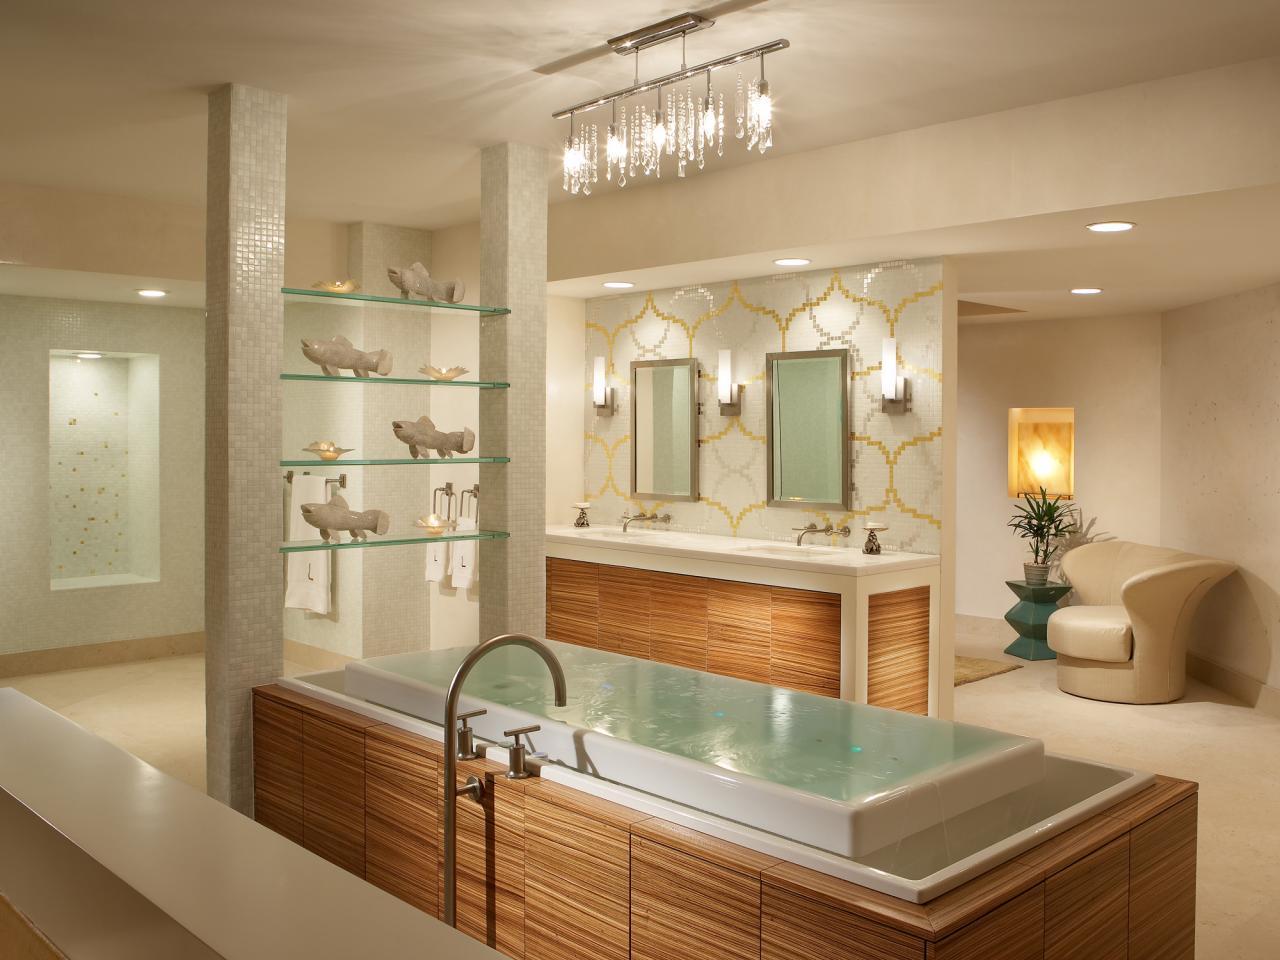 spa bathroom design ideas pictures photo - 5